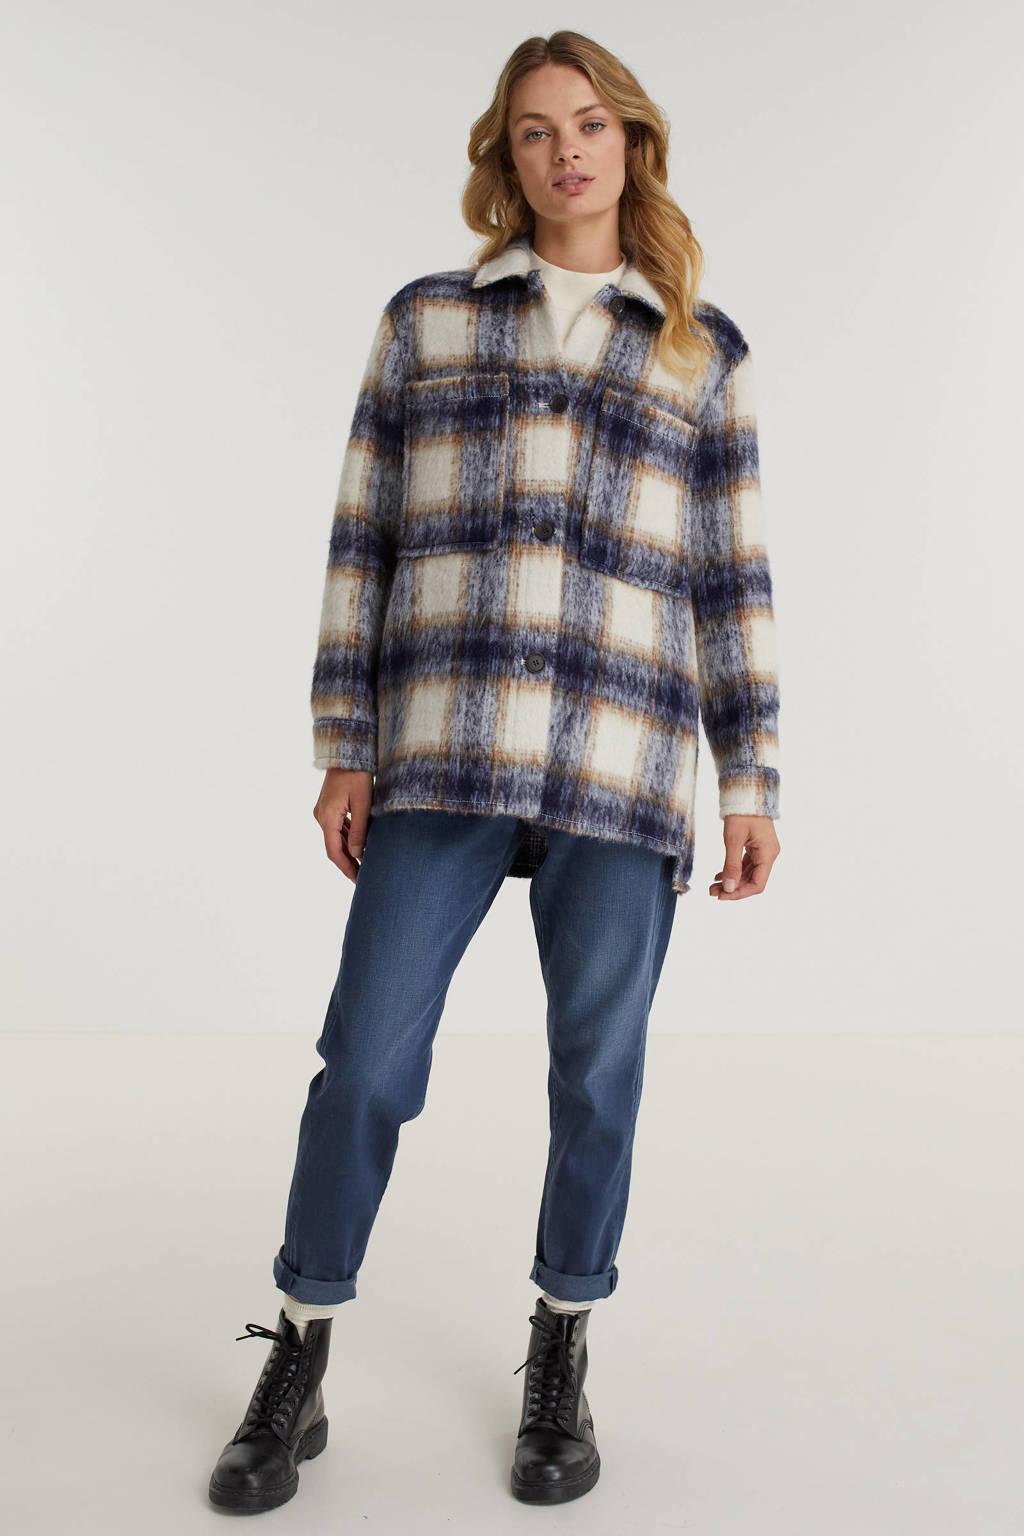 ESPRIT Women Casual geruite shacket met wol ecru/blauw, Ecru/blauw